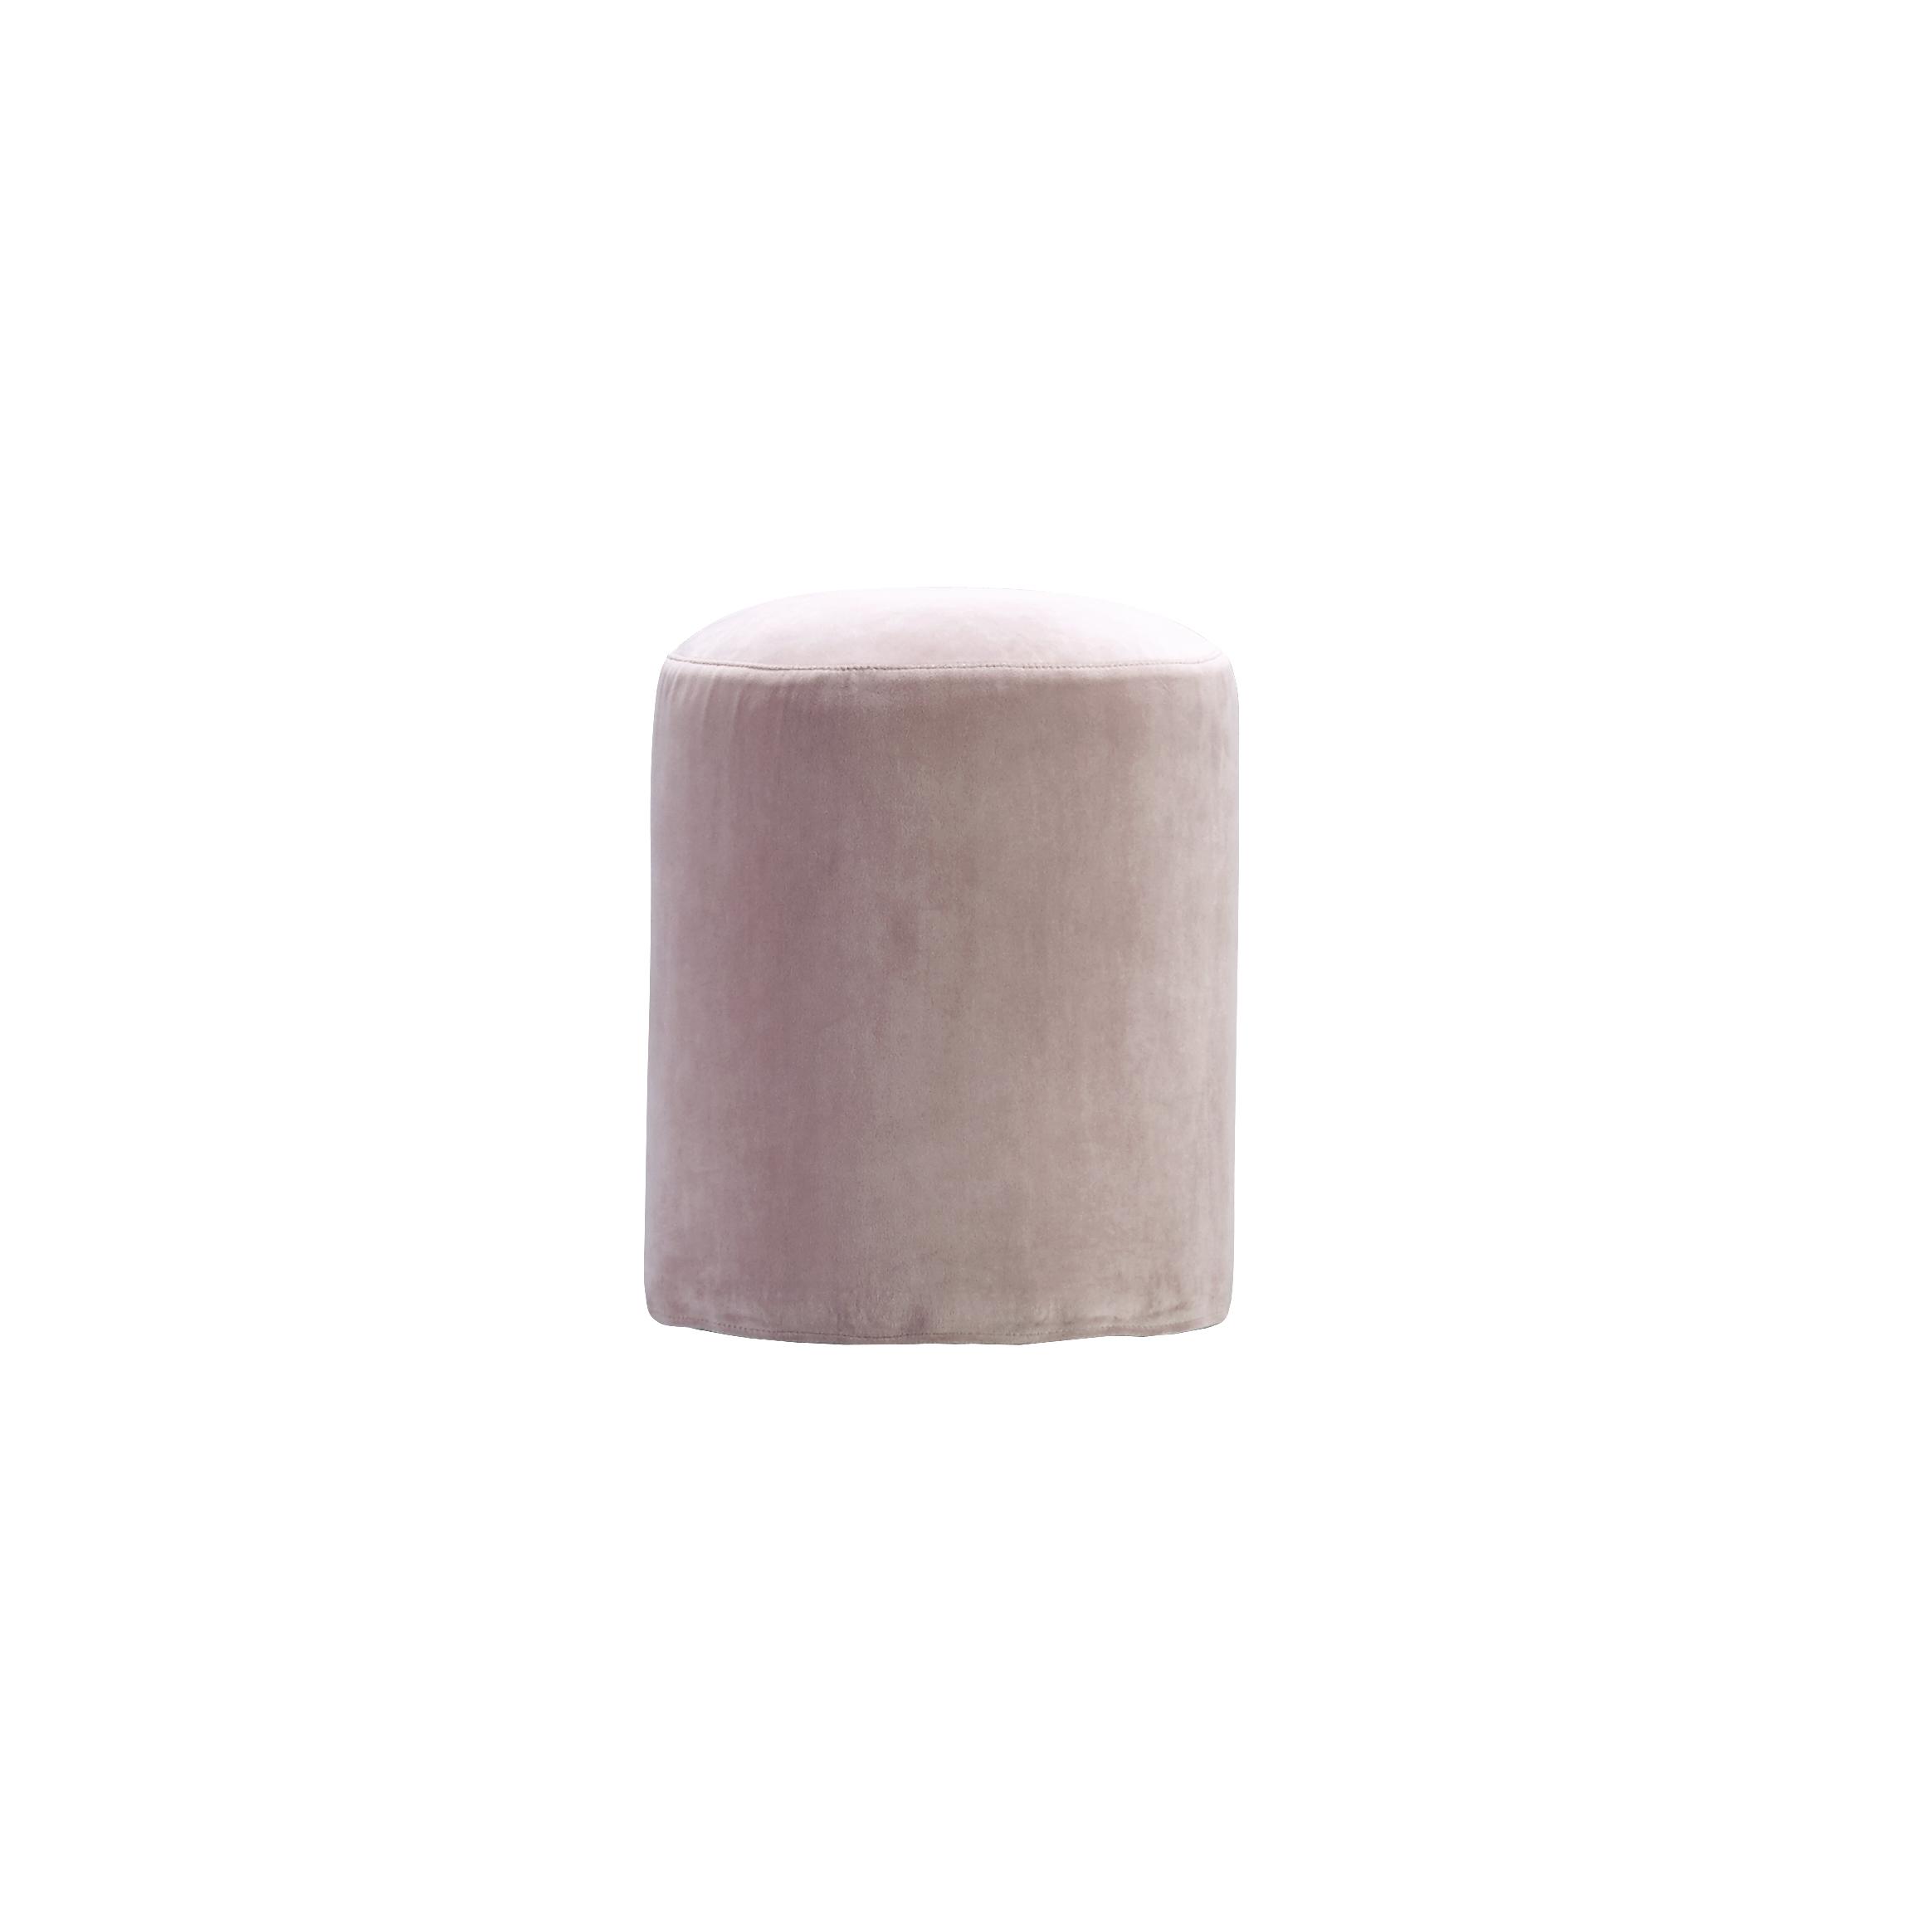 pouf round dia 35 x h 45 cm velvet rose products tine k home. Black Bedroom Furniture Sets. Home Design Ideas